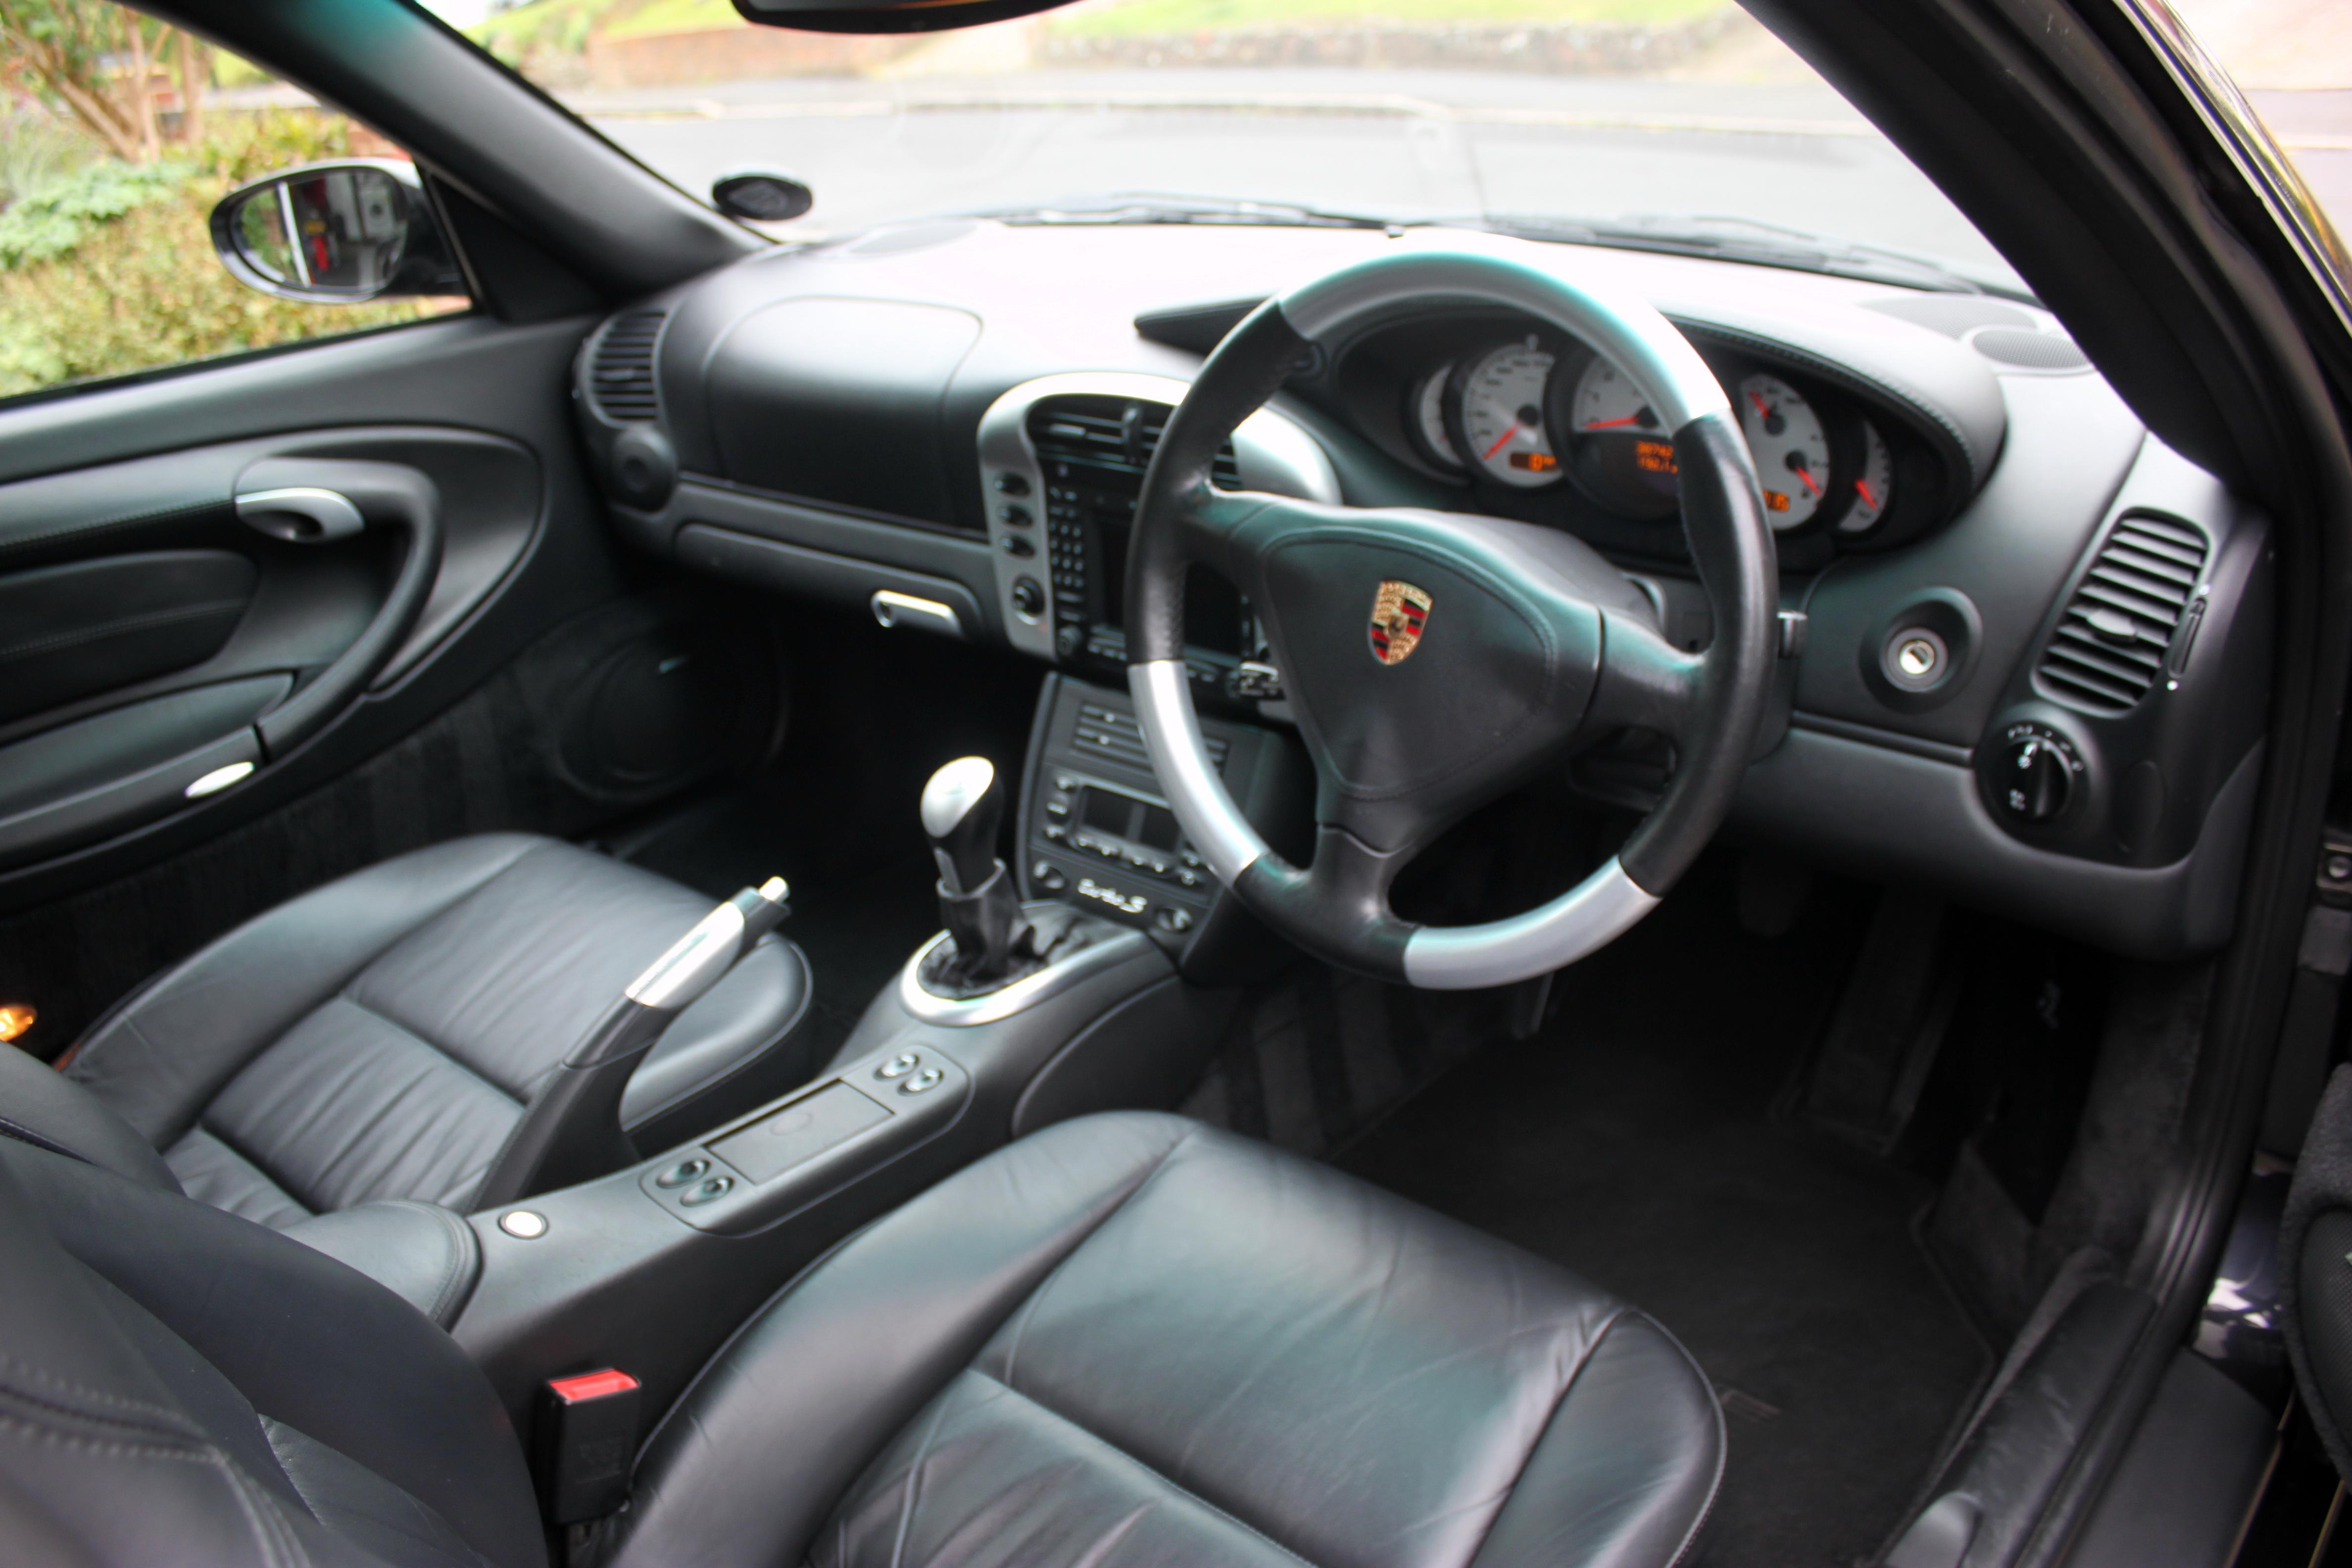 Porsche 996 Turbo S interior